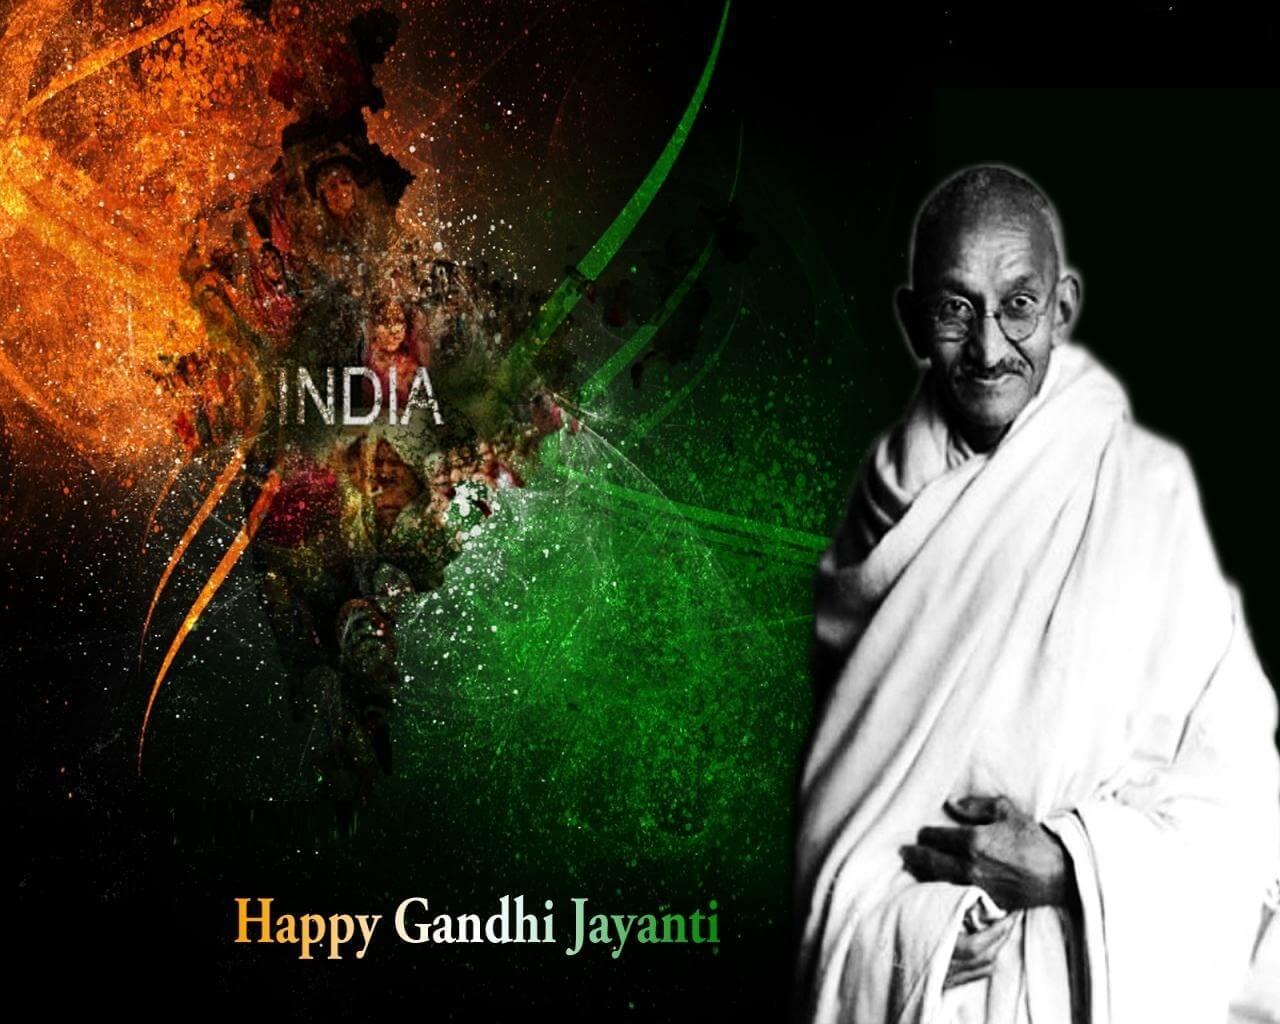 happy gandhi jayanti october 2 hd wallpaper